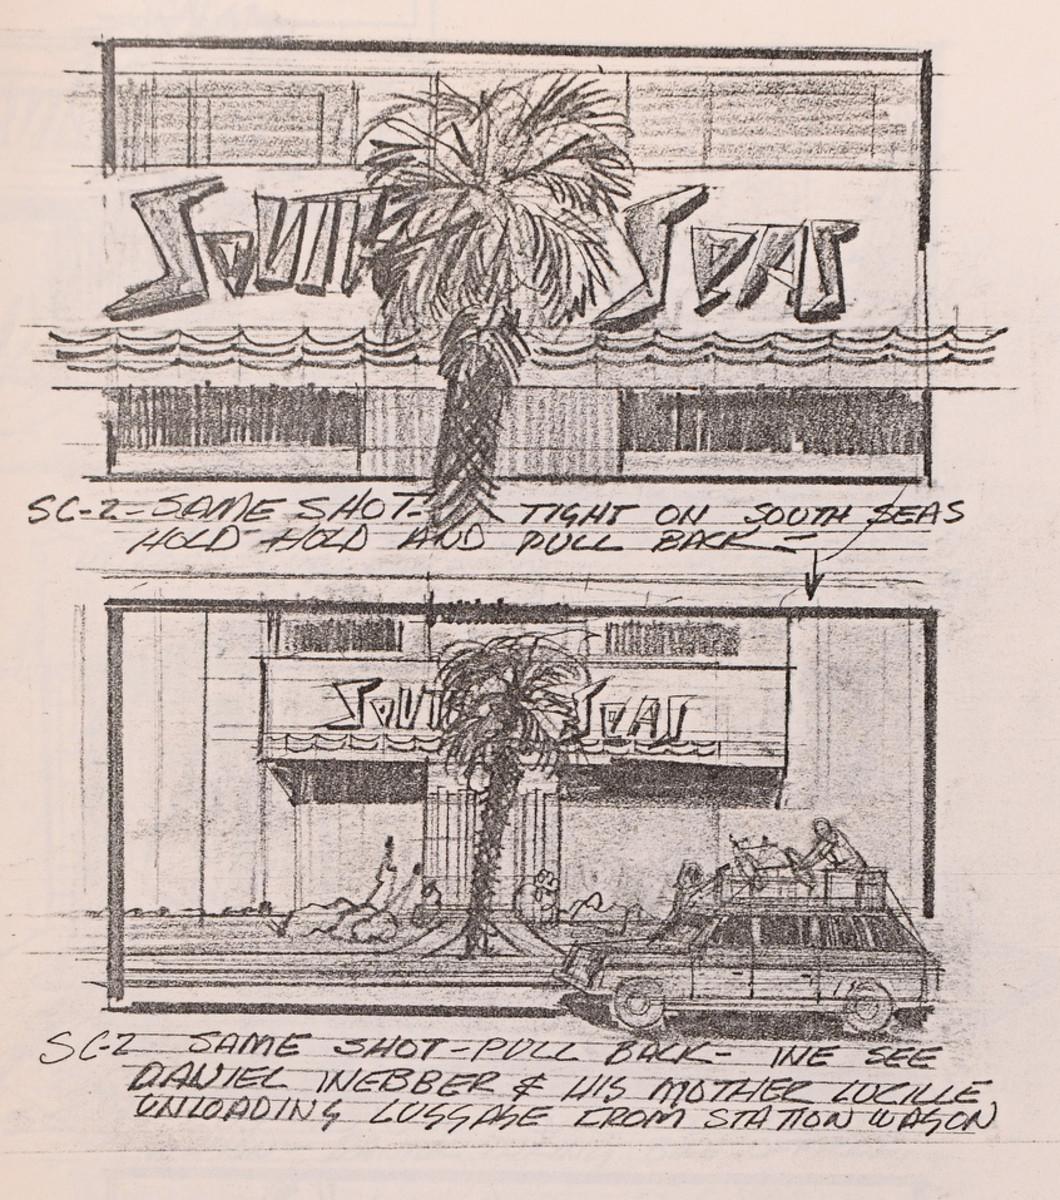 Storyboard: South Seas scene in Los Angeles.